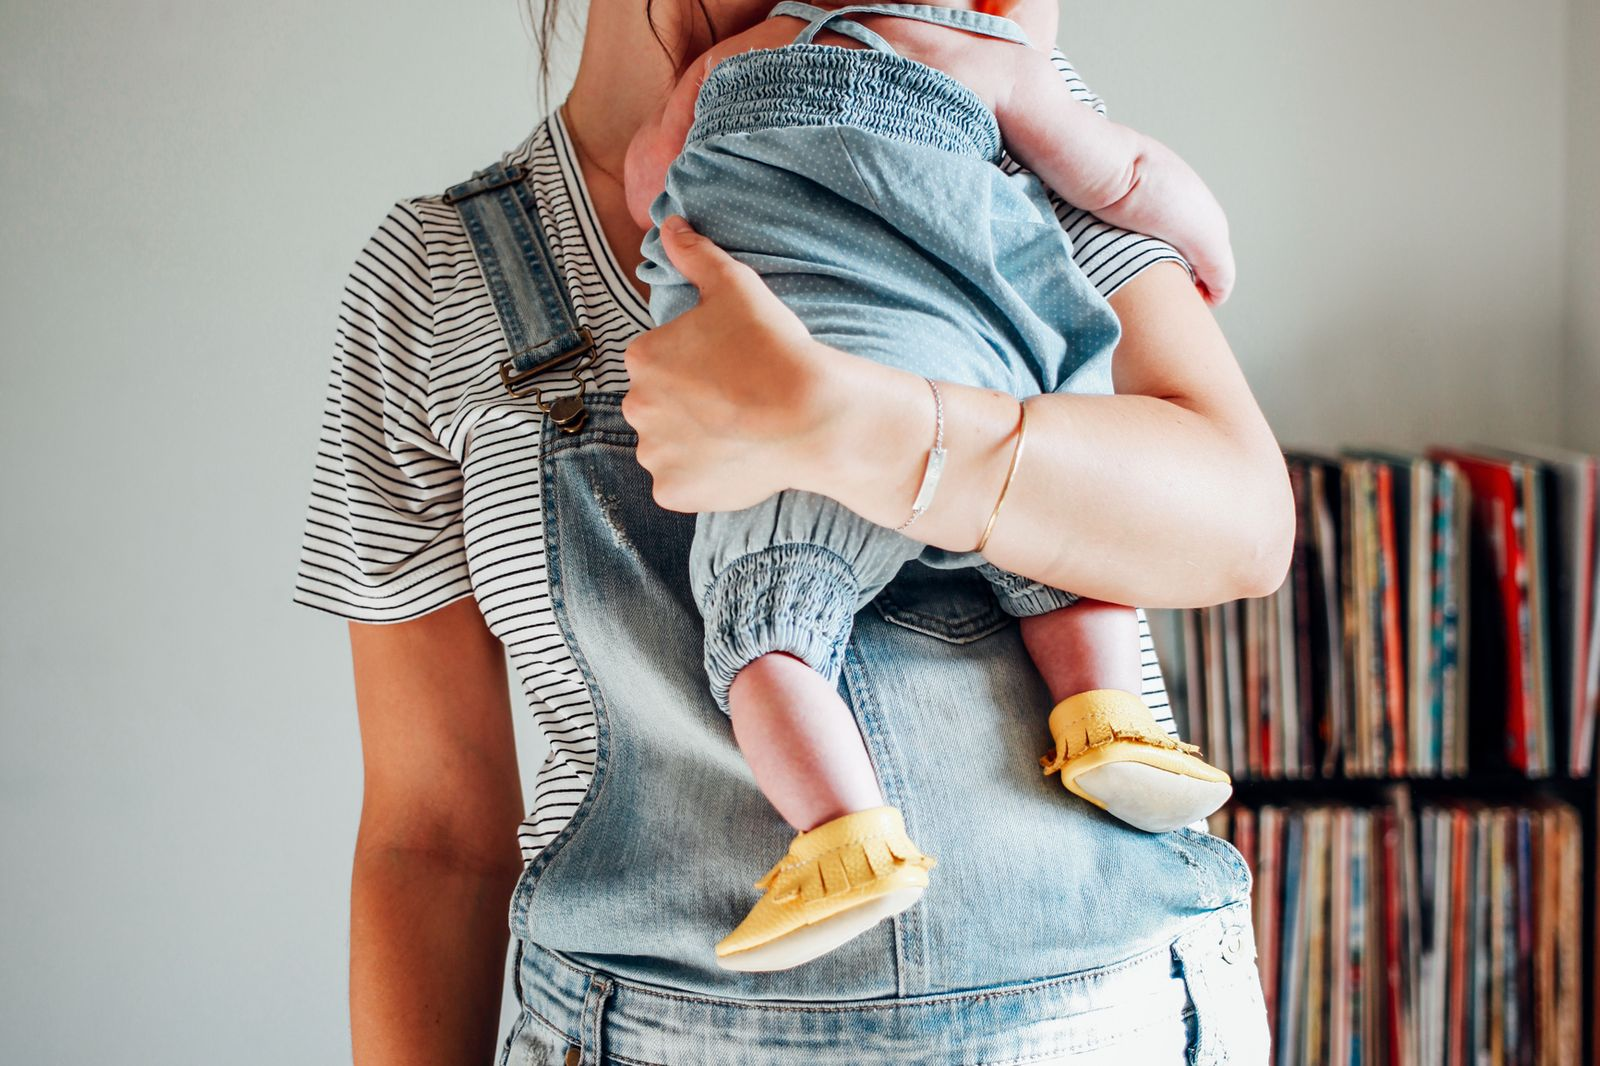 Mother Holding Baby On Her Shoulder